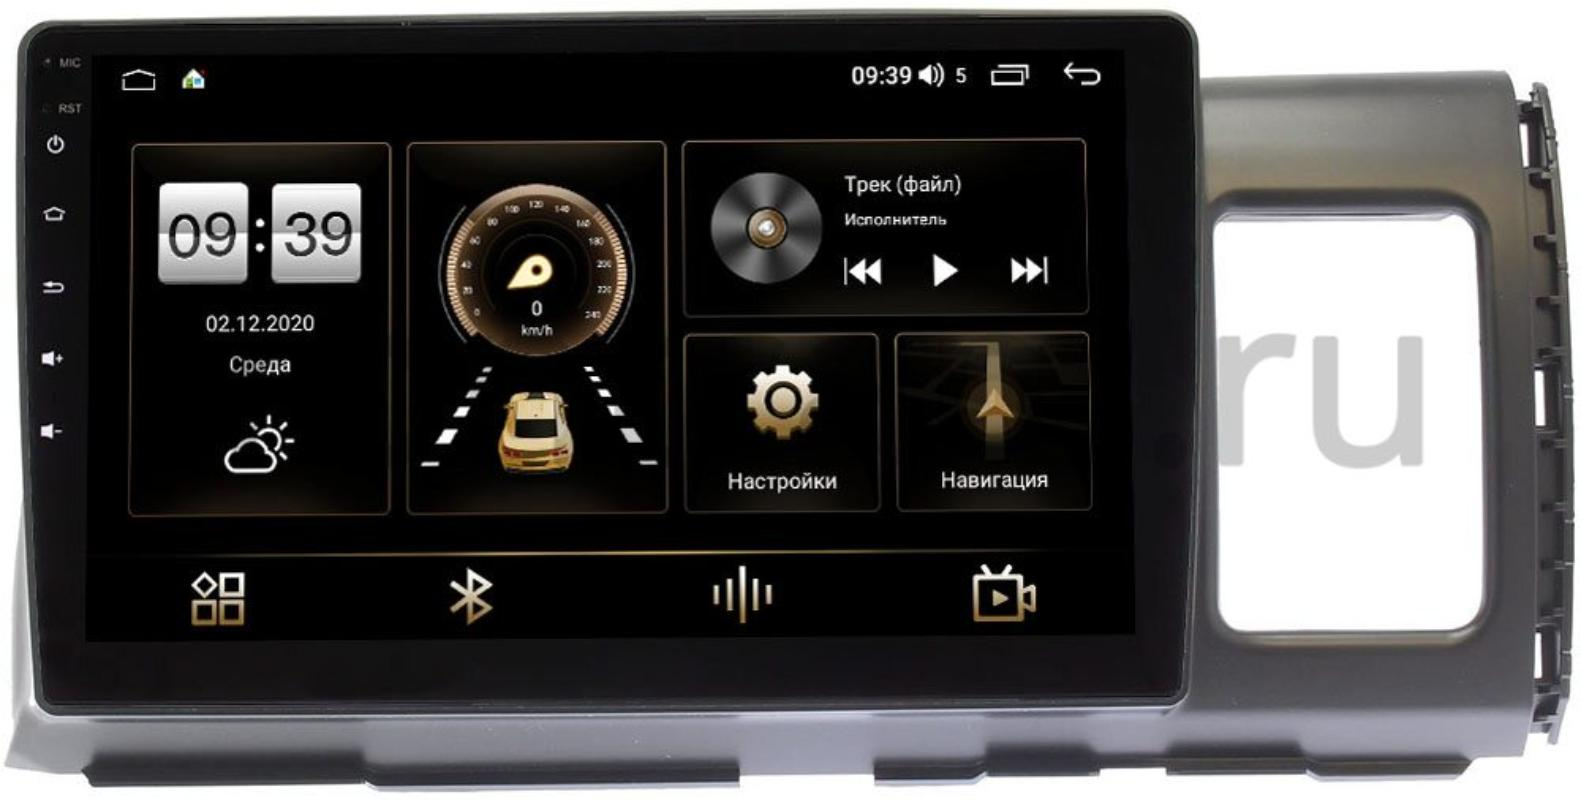 Штатная магнитола Toyota Wish I 2003-2009 LeTrun 4165-10-1141 на Android 10 (4G-SIM, 3/32, DSP, QLed) (+ Камера заднего вида в подарок!)